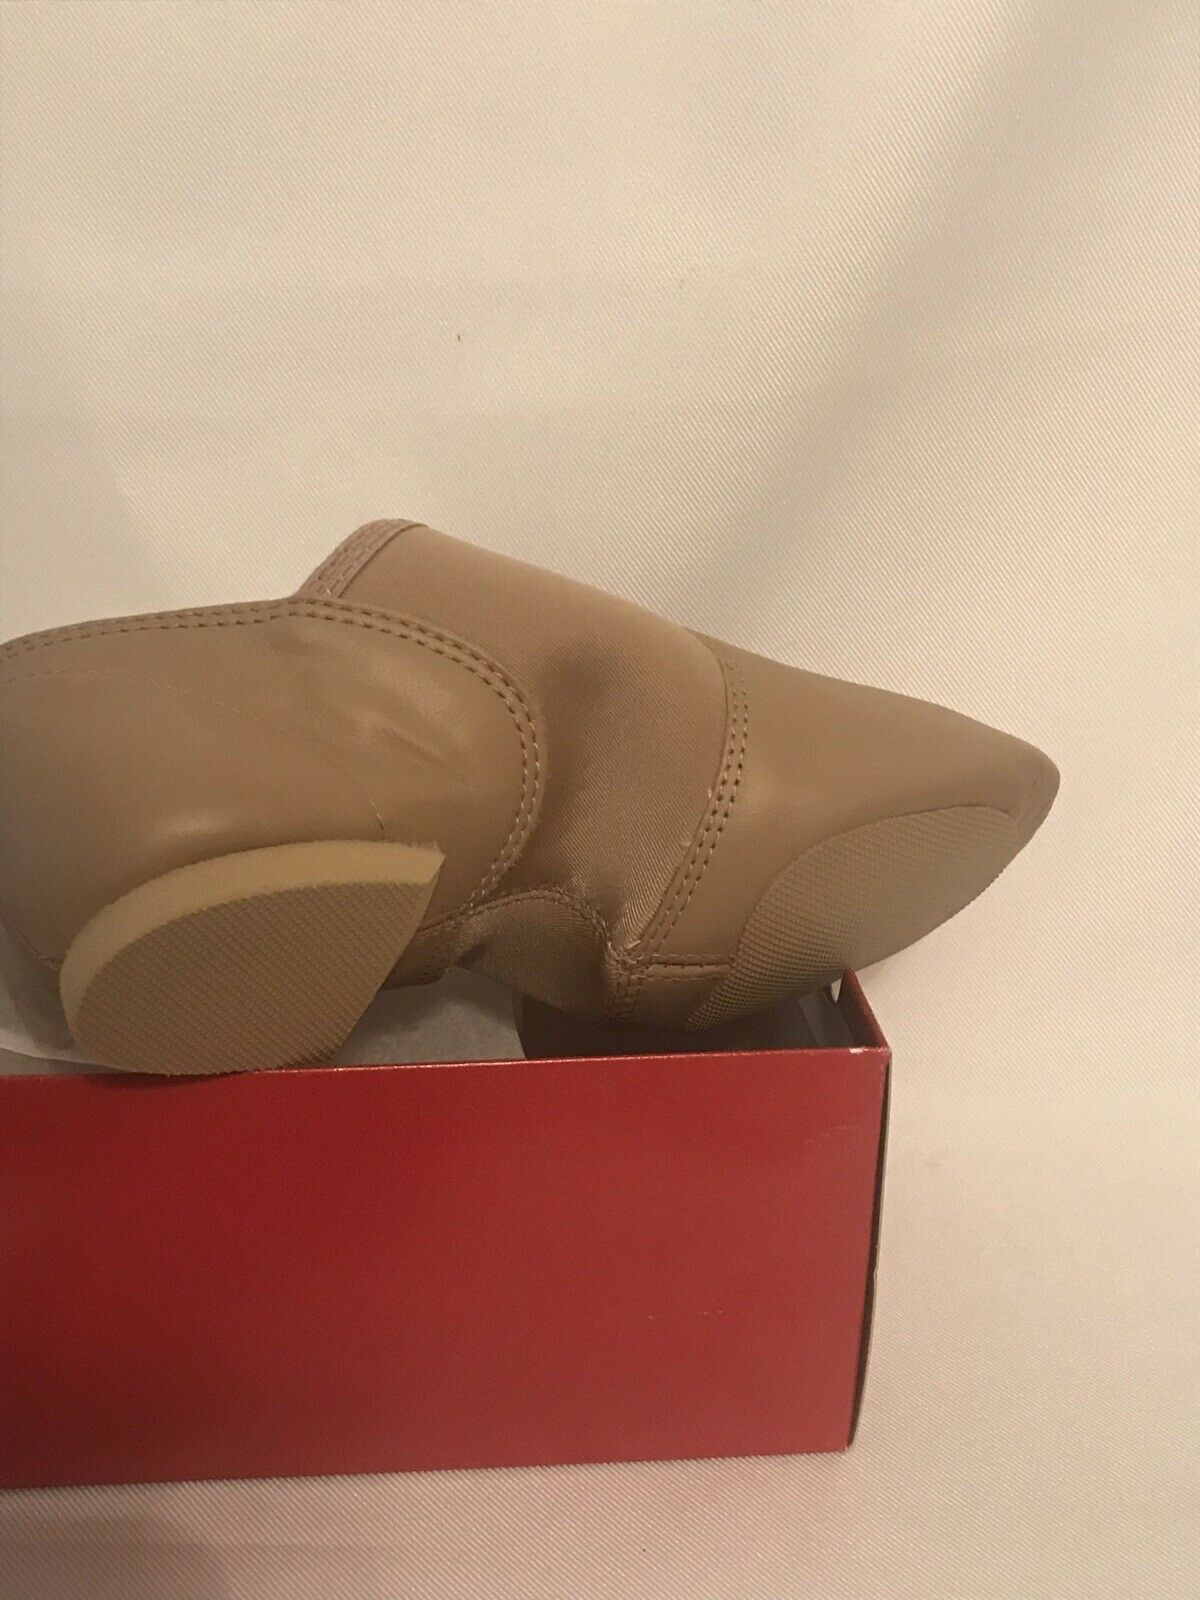 Capezio Caramel E-Series Jazz Slip On Split Sole Shoe kids size 7M image 3